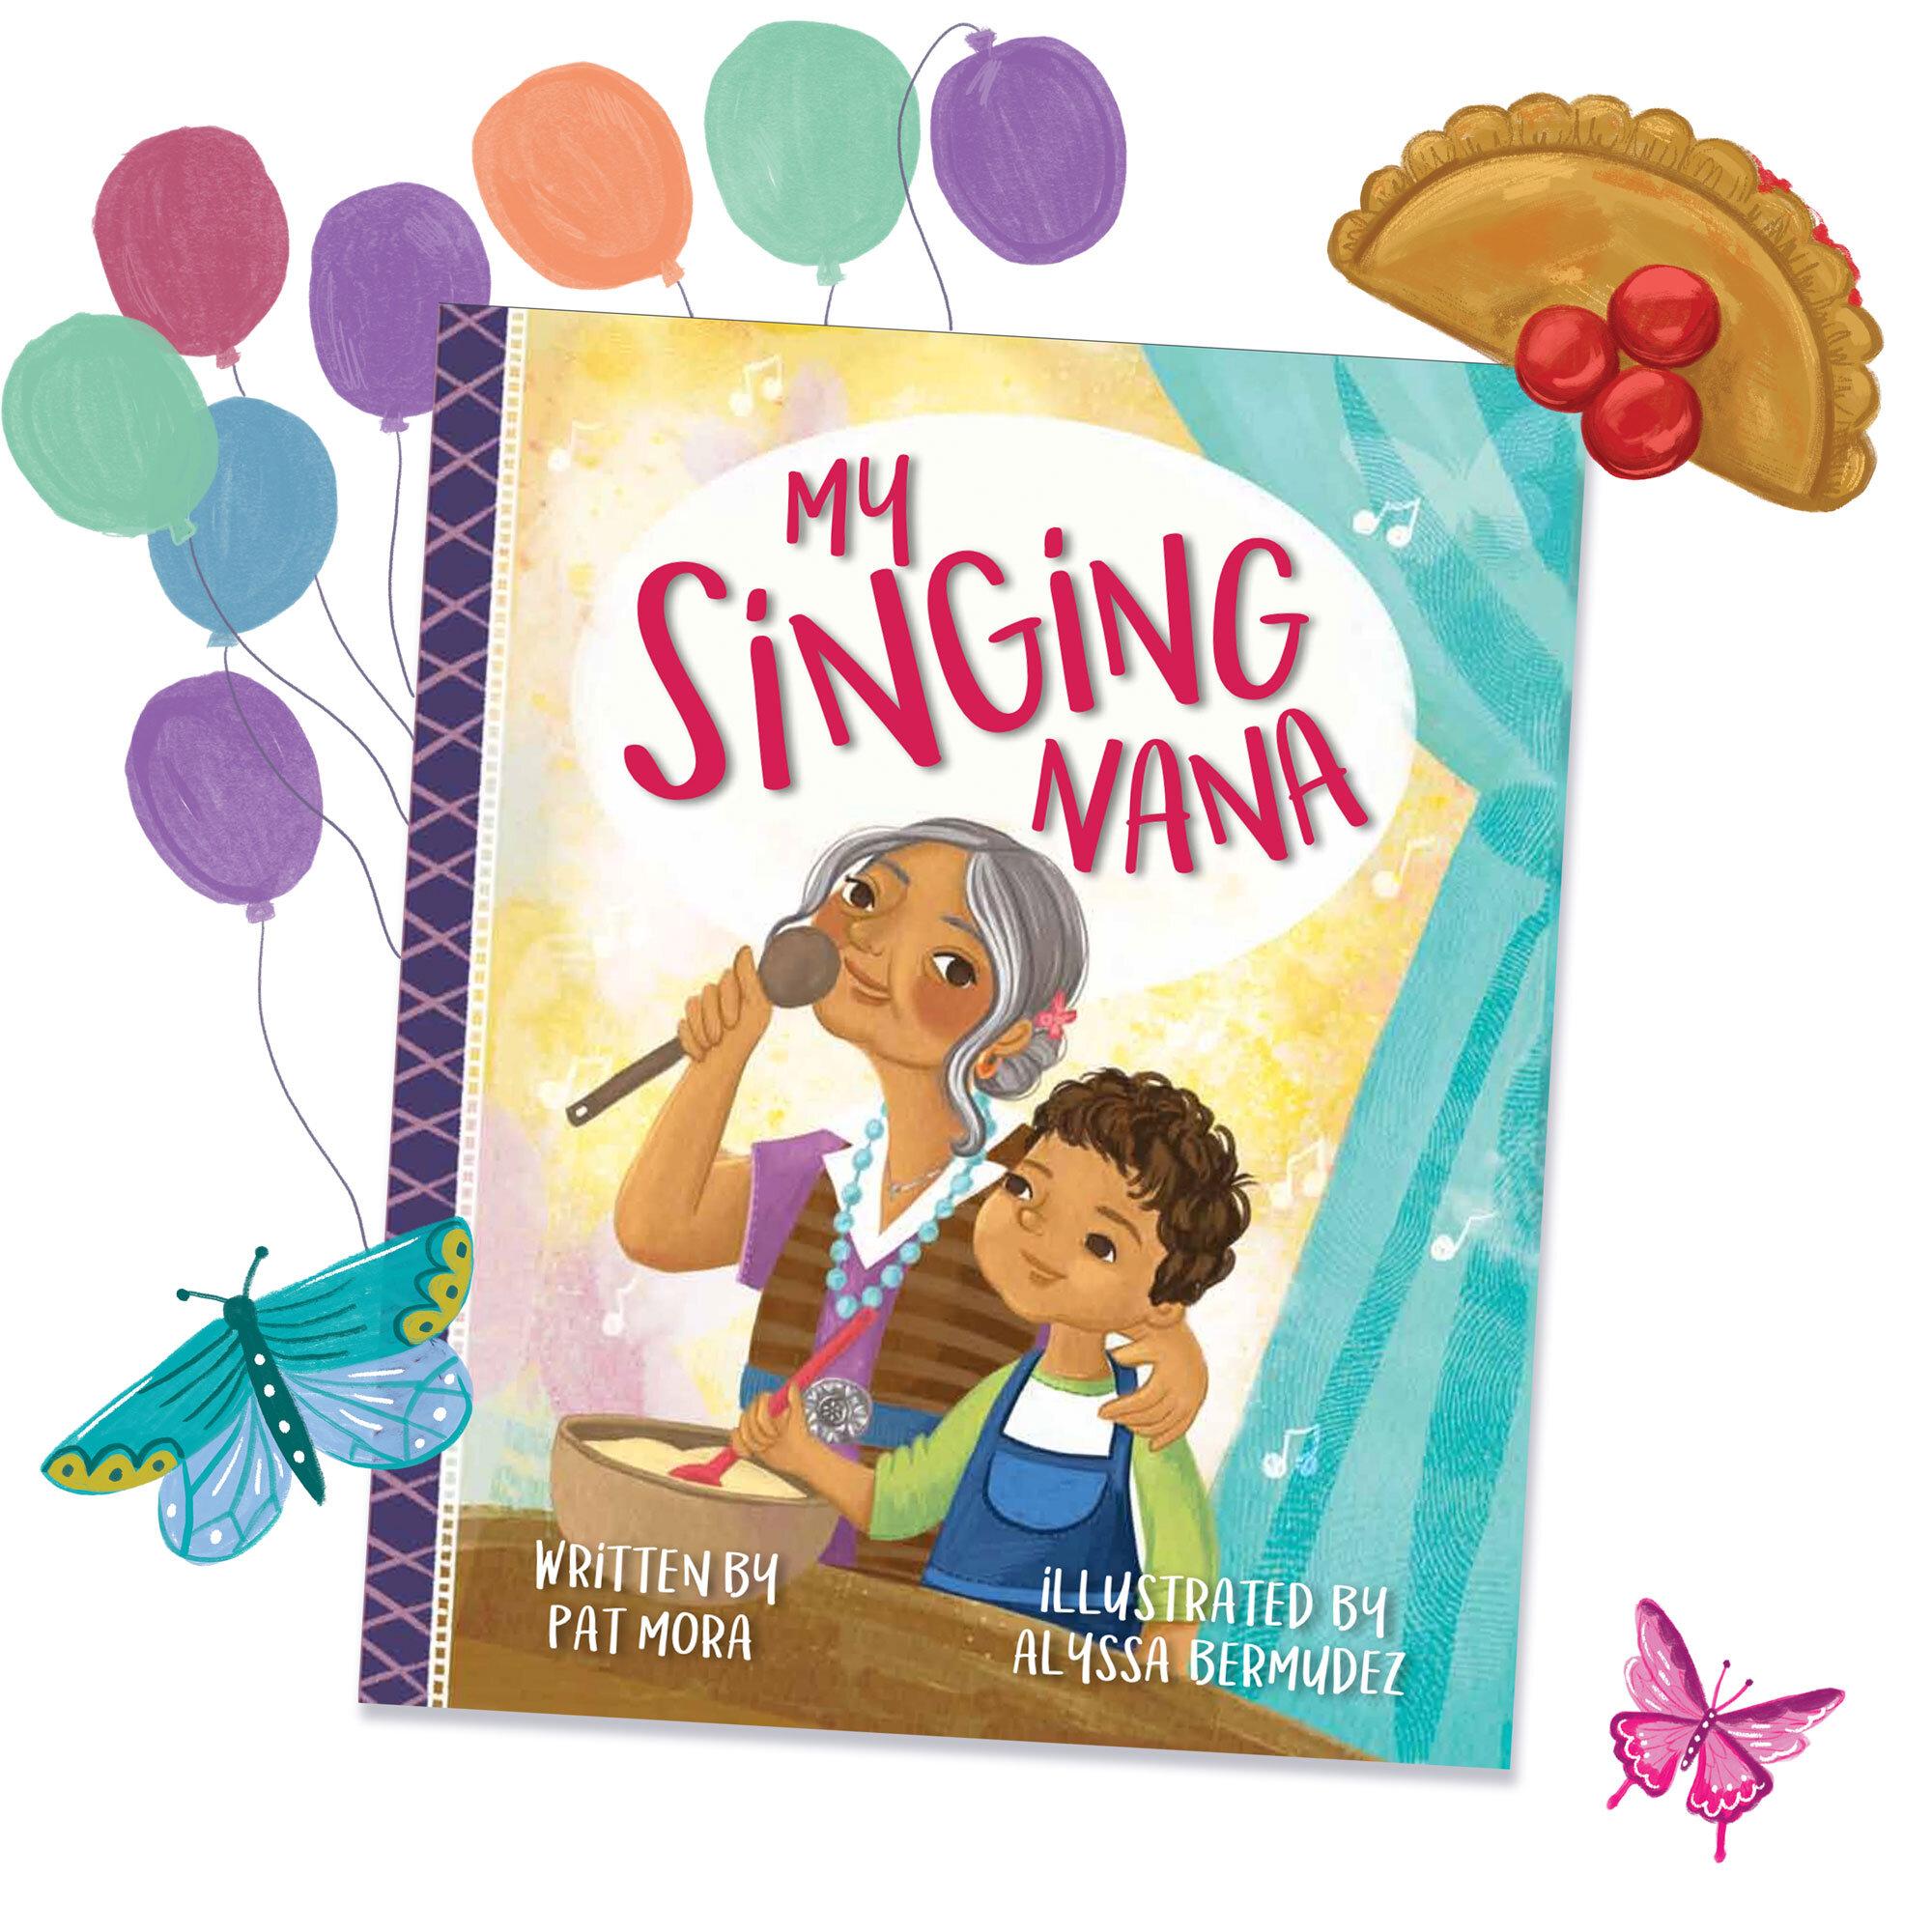 My Singing Nana Book